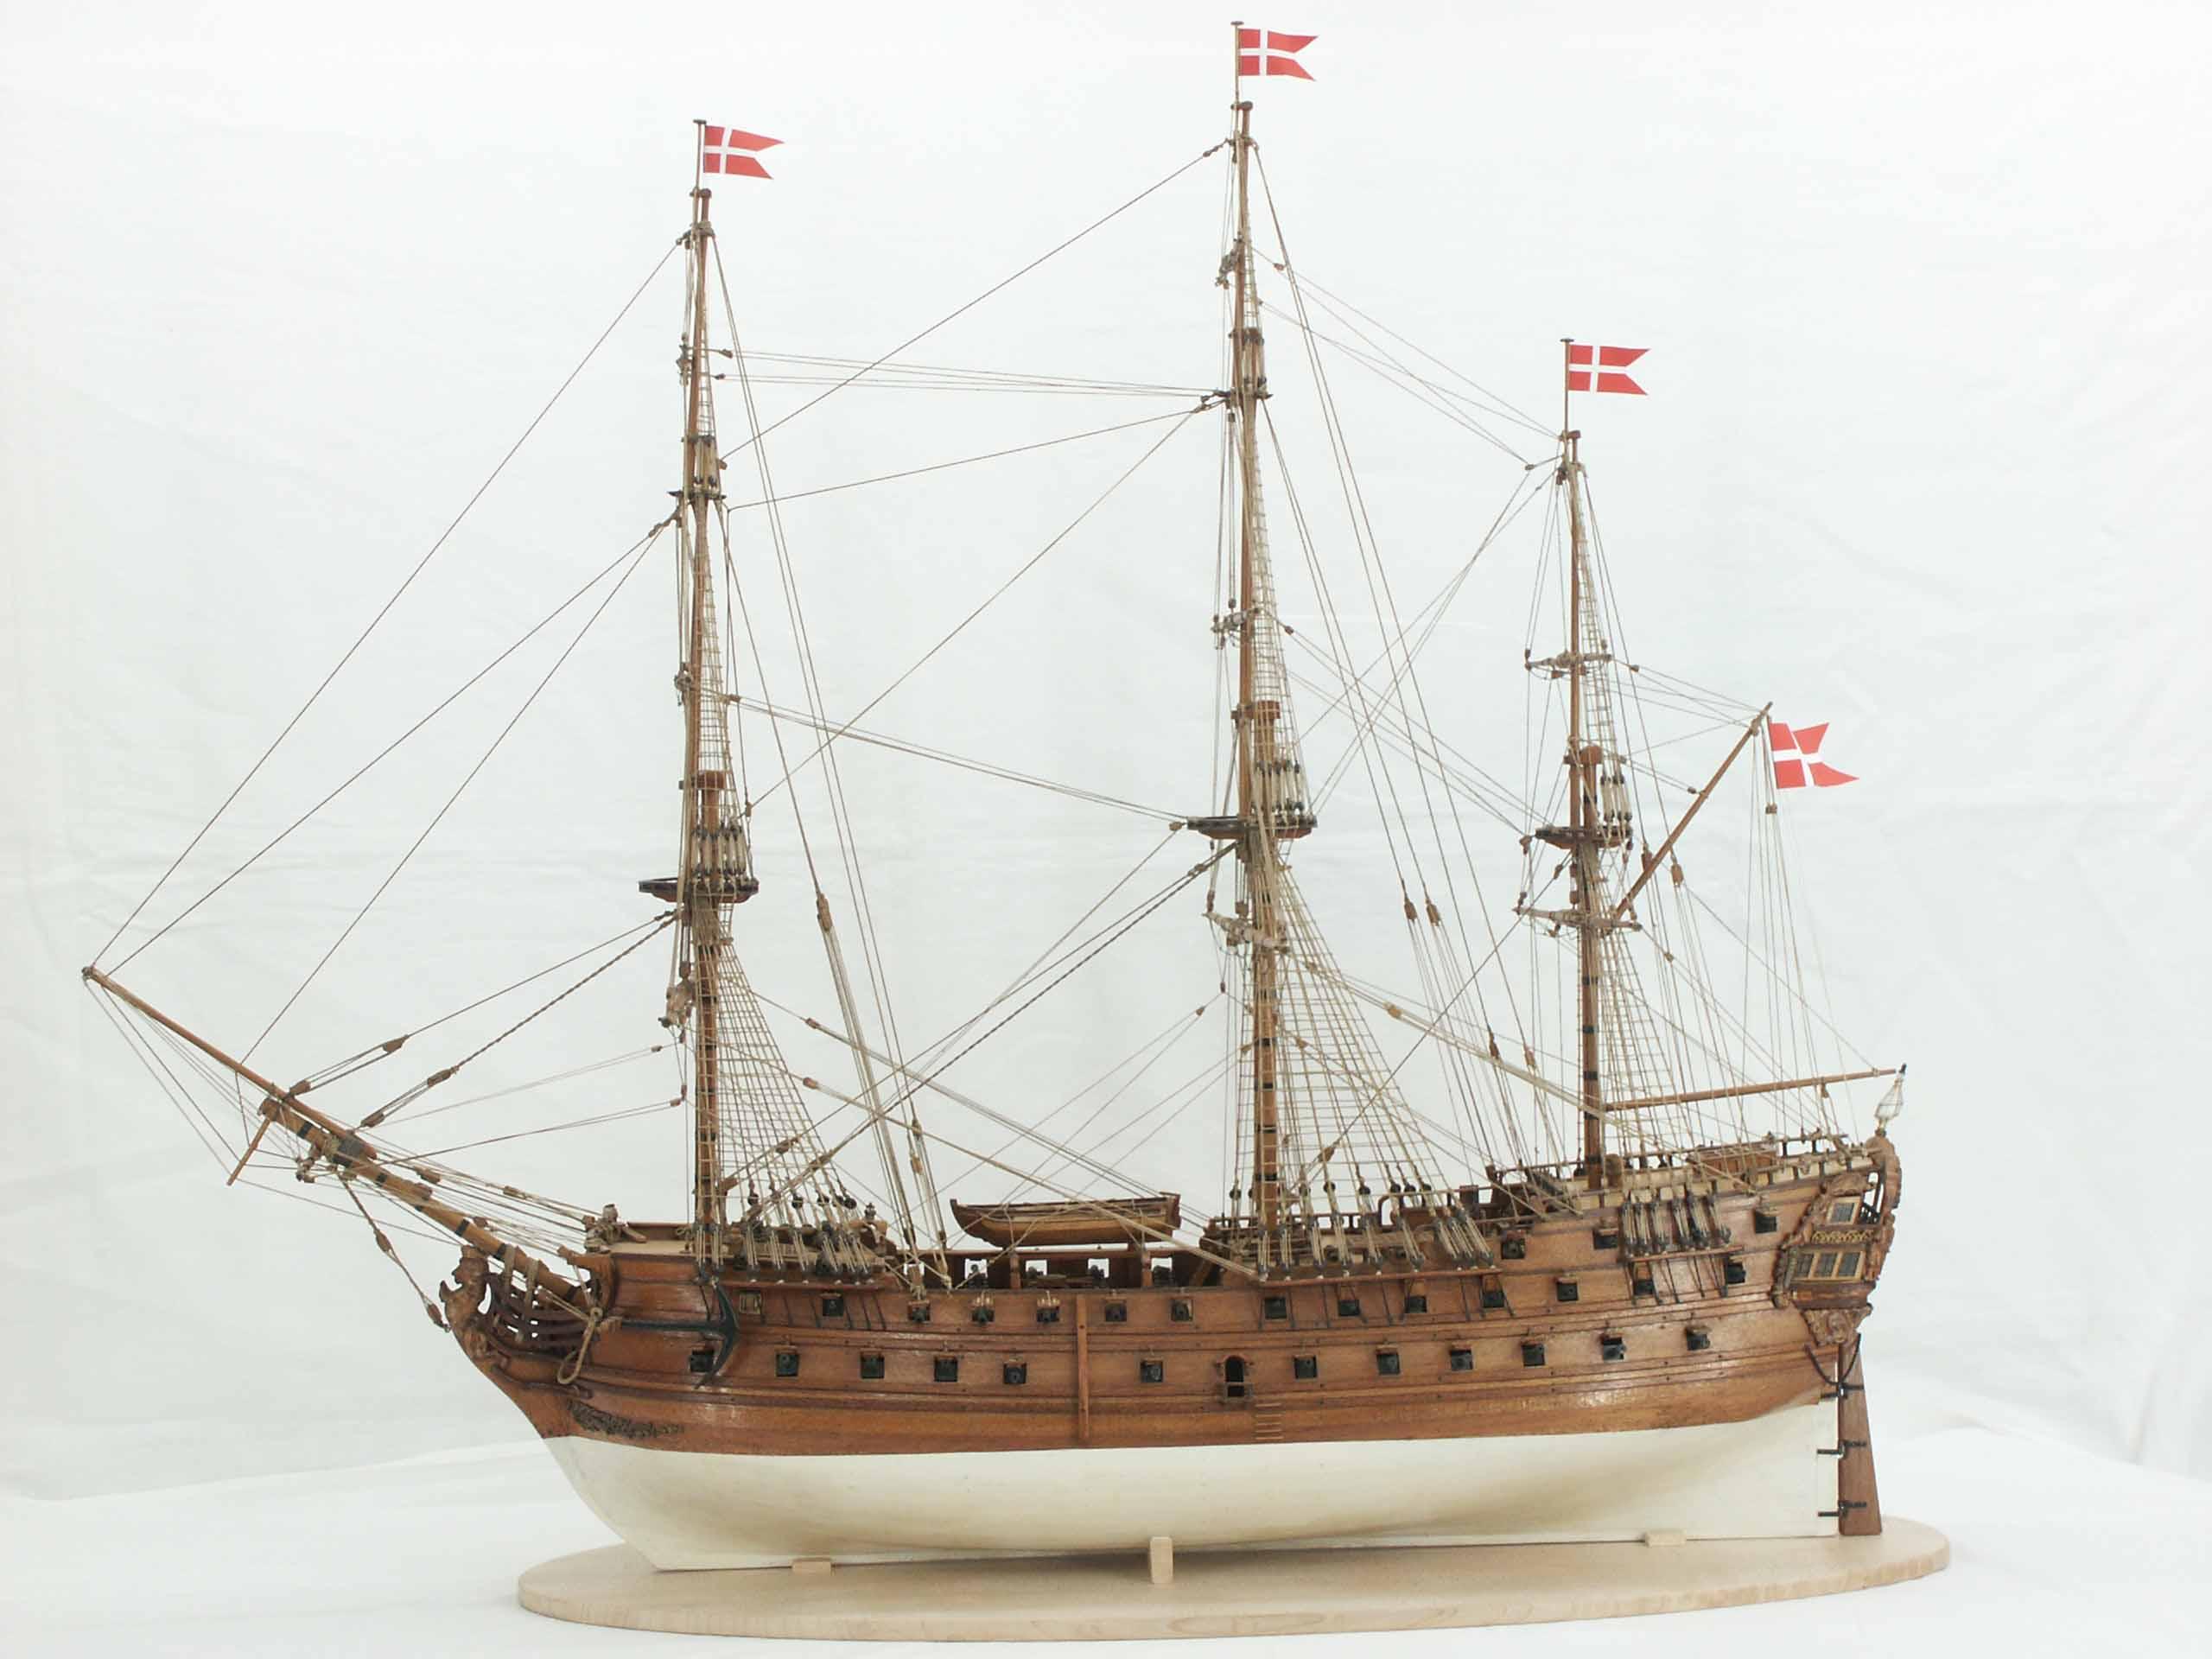 Model wooden ships for sale